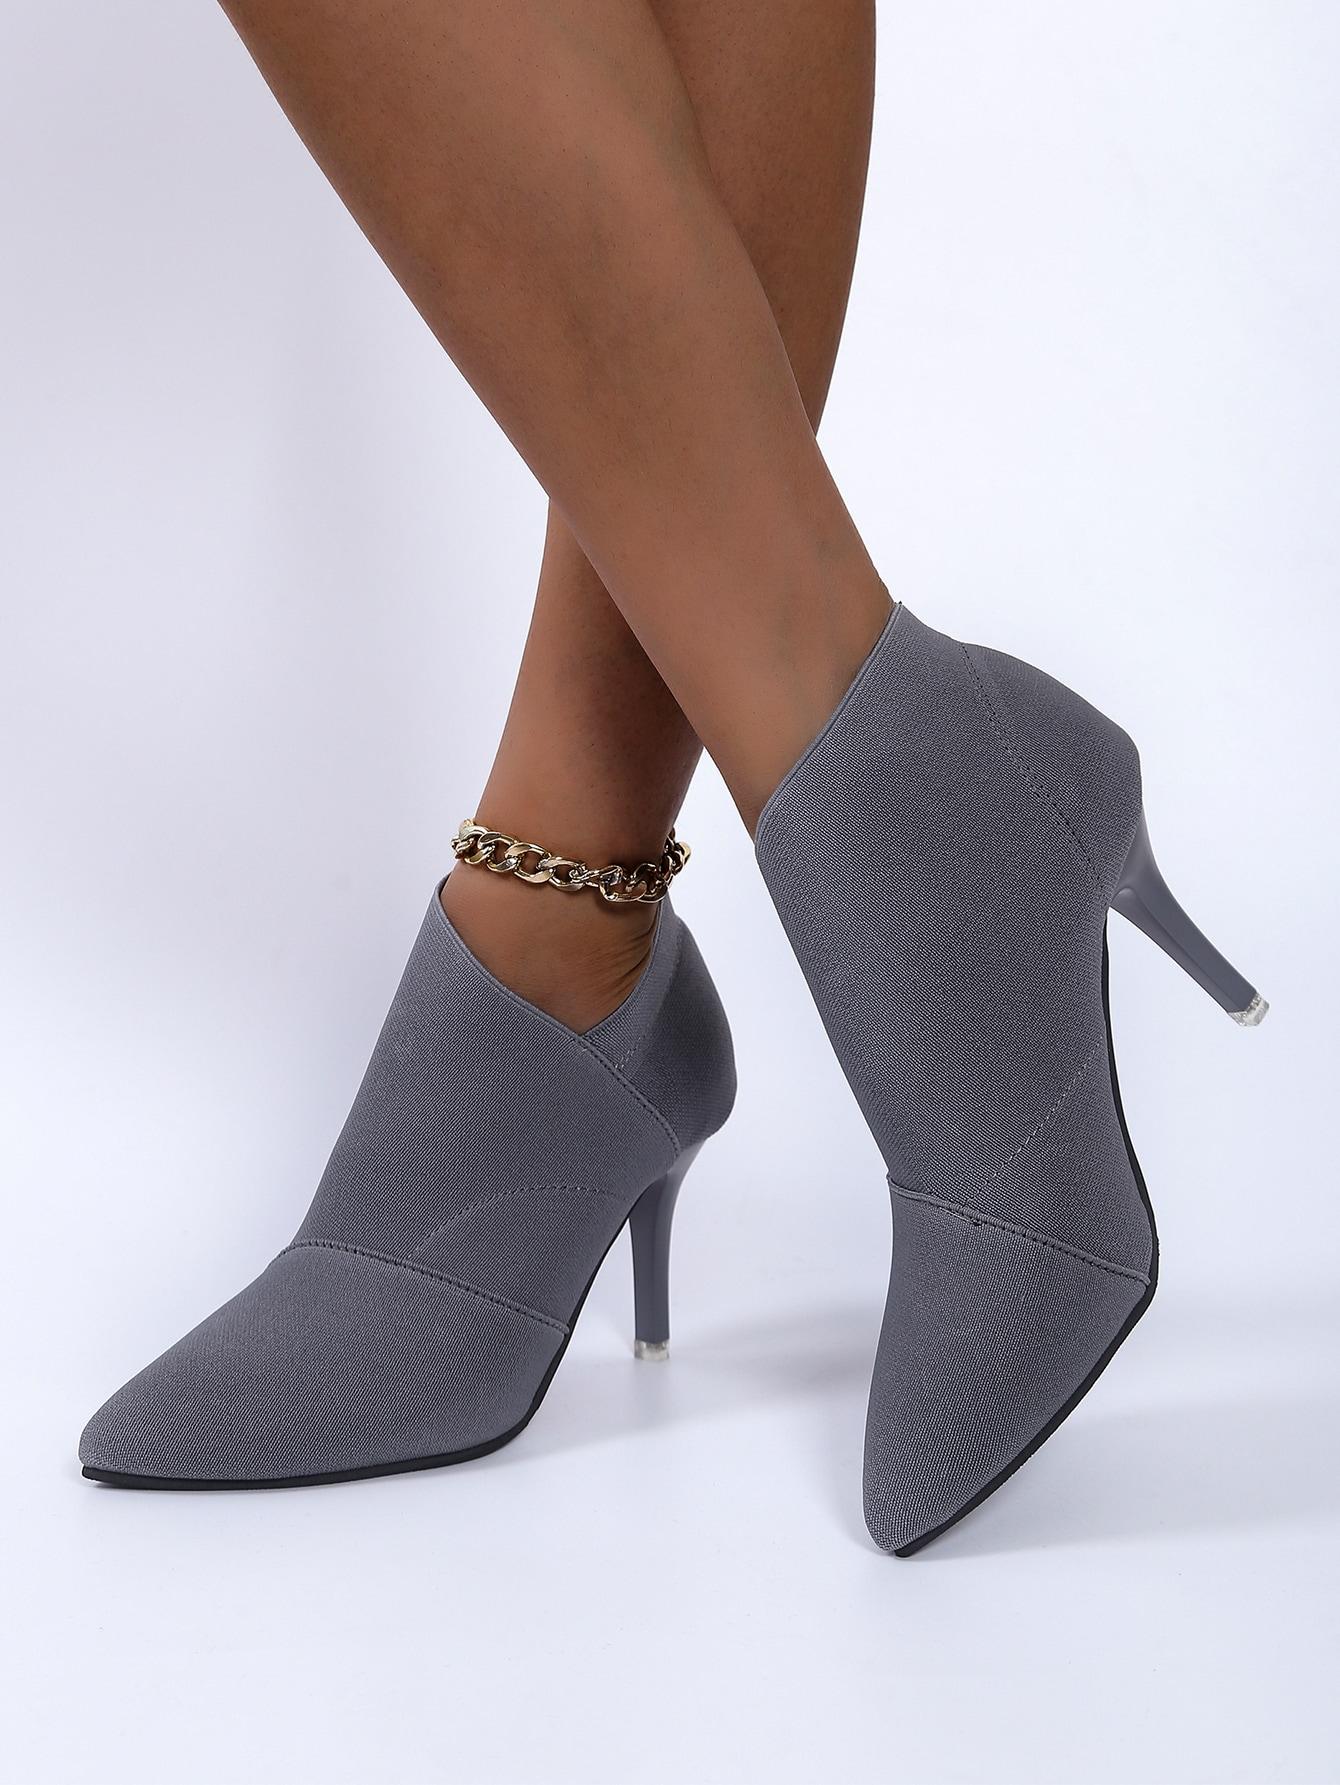 Point Toe Stiletto Heeled Boots